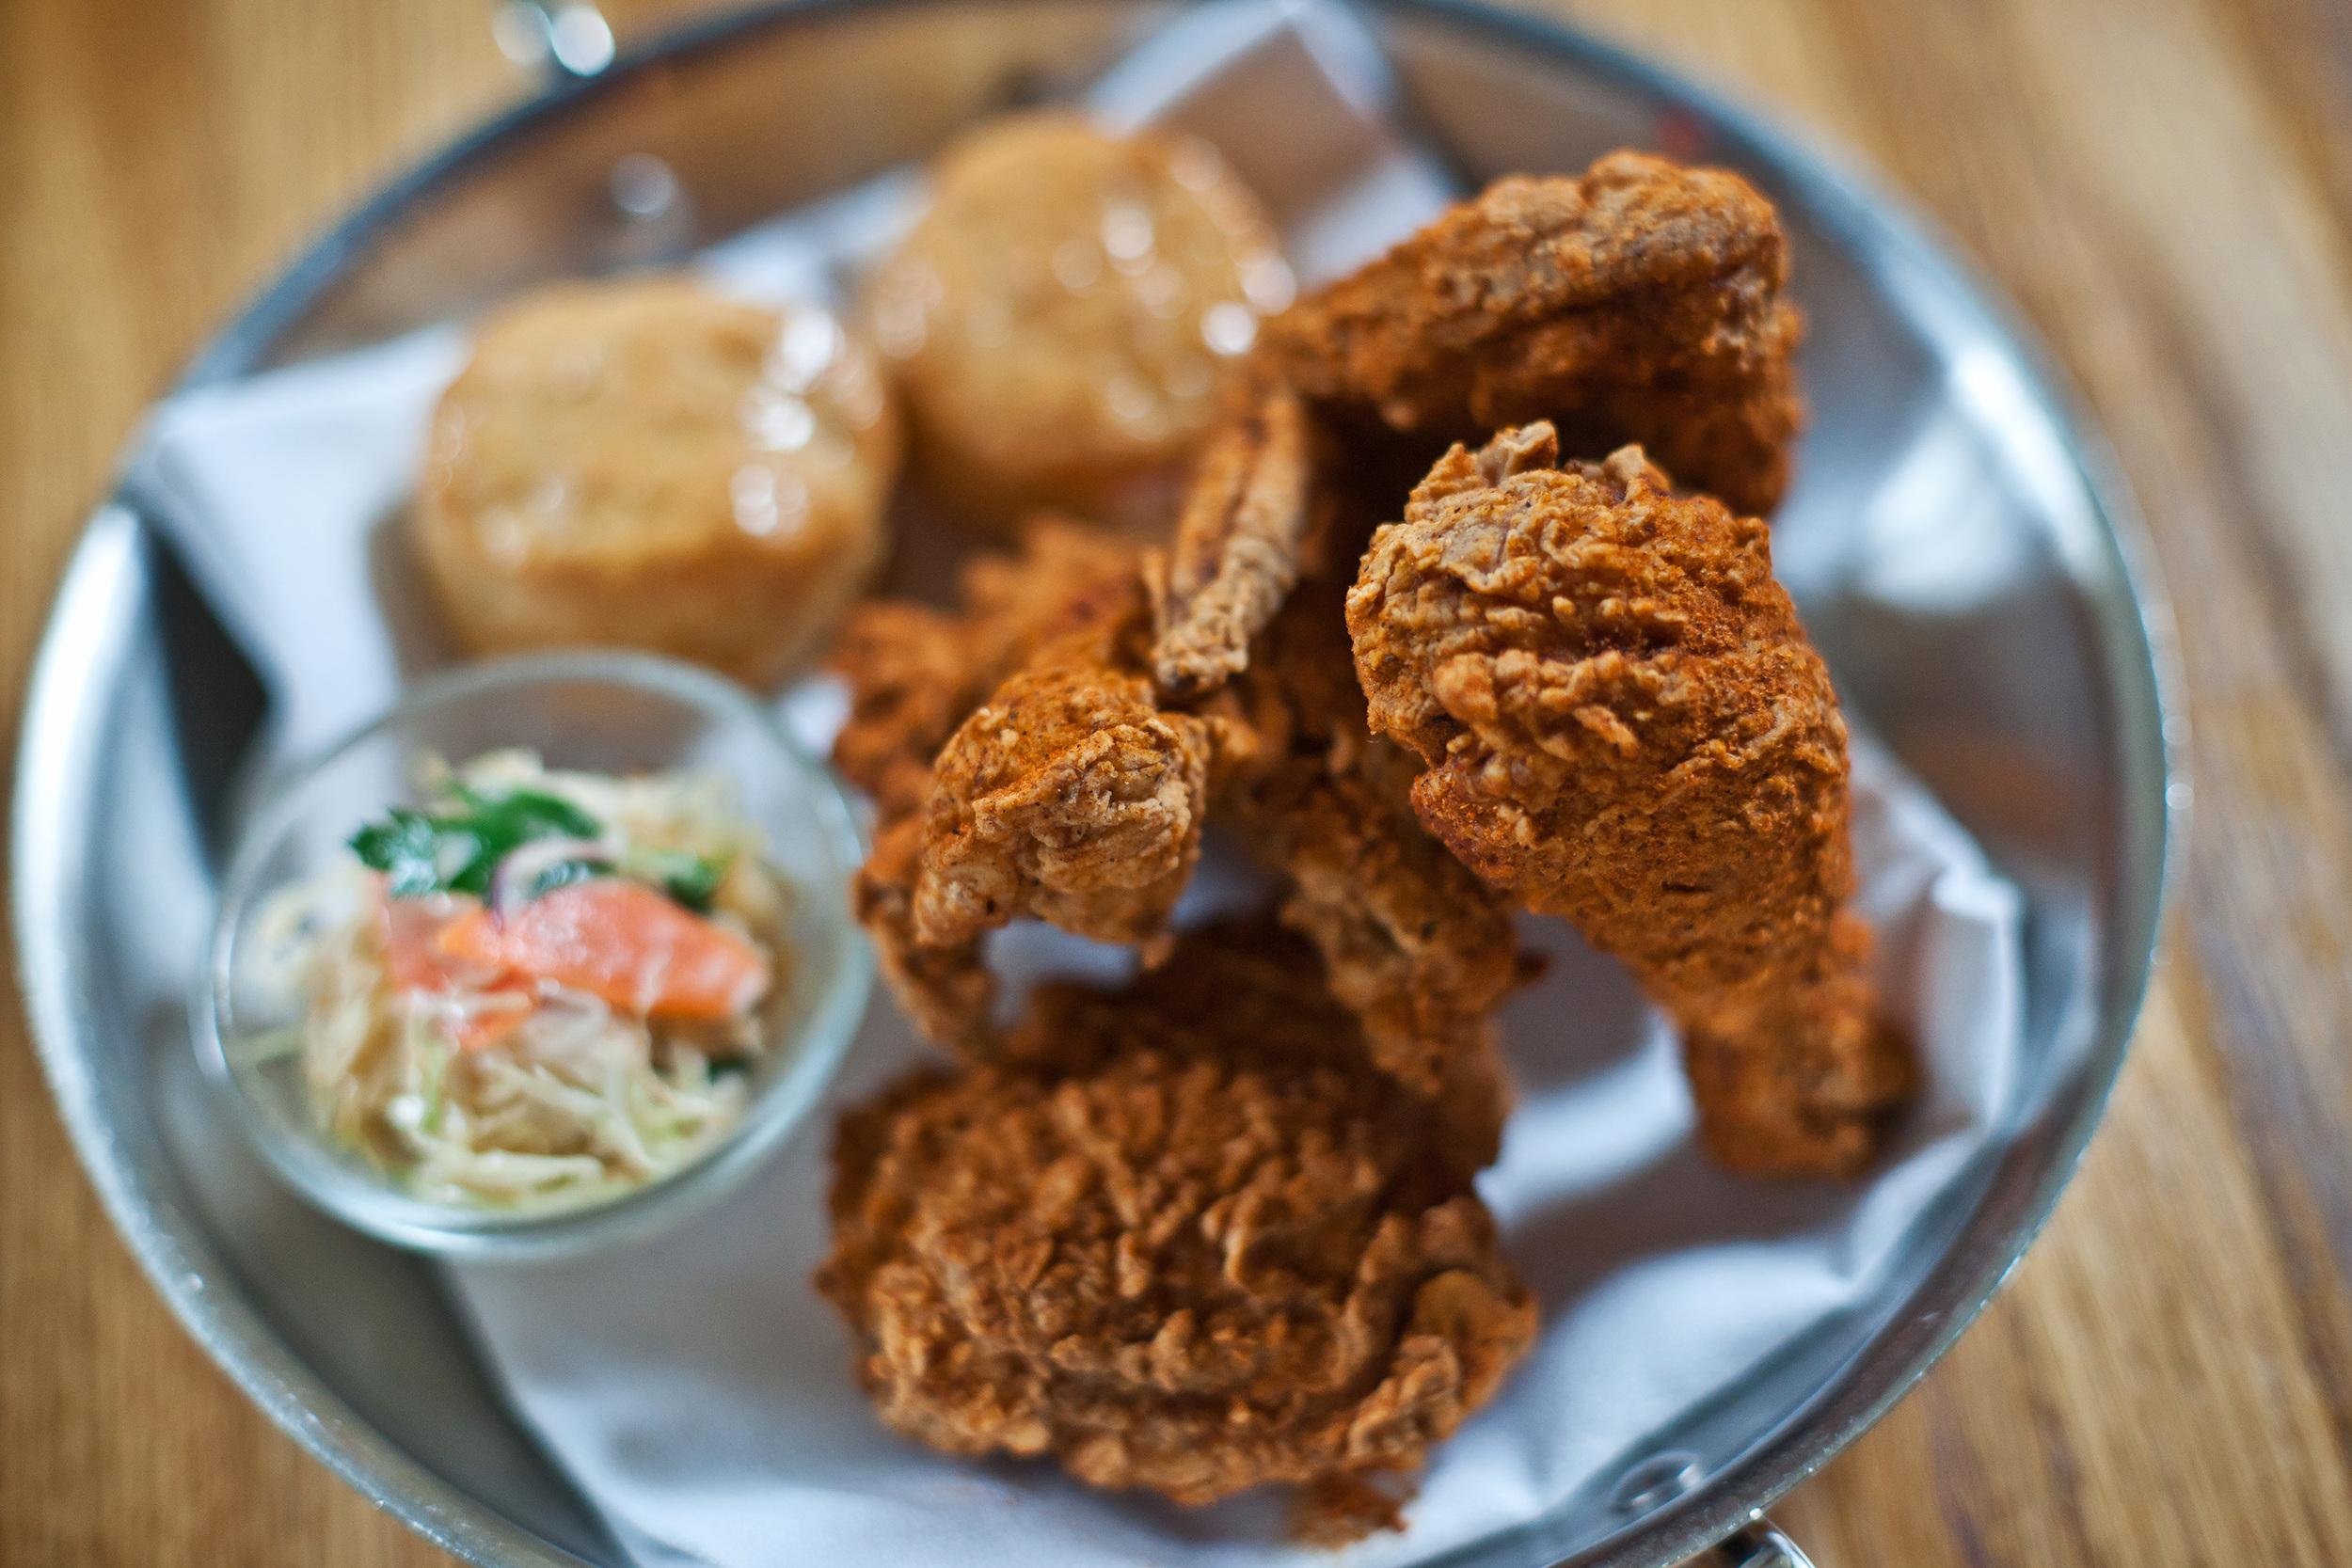 Hot Fried Chicken & Honey Butter Biscuits